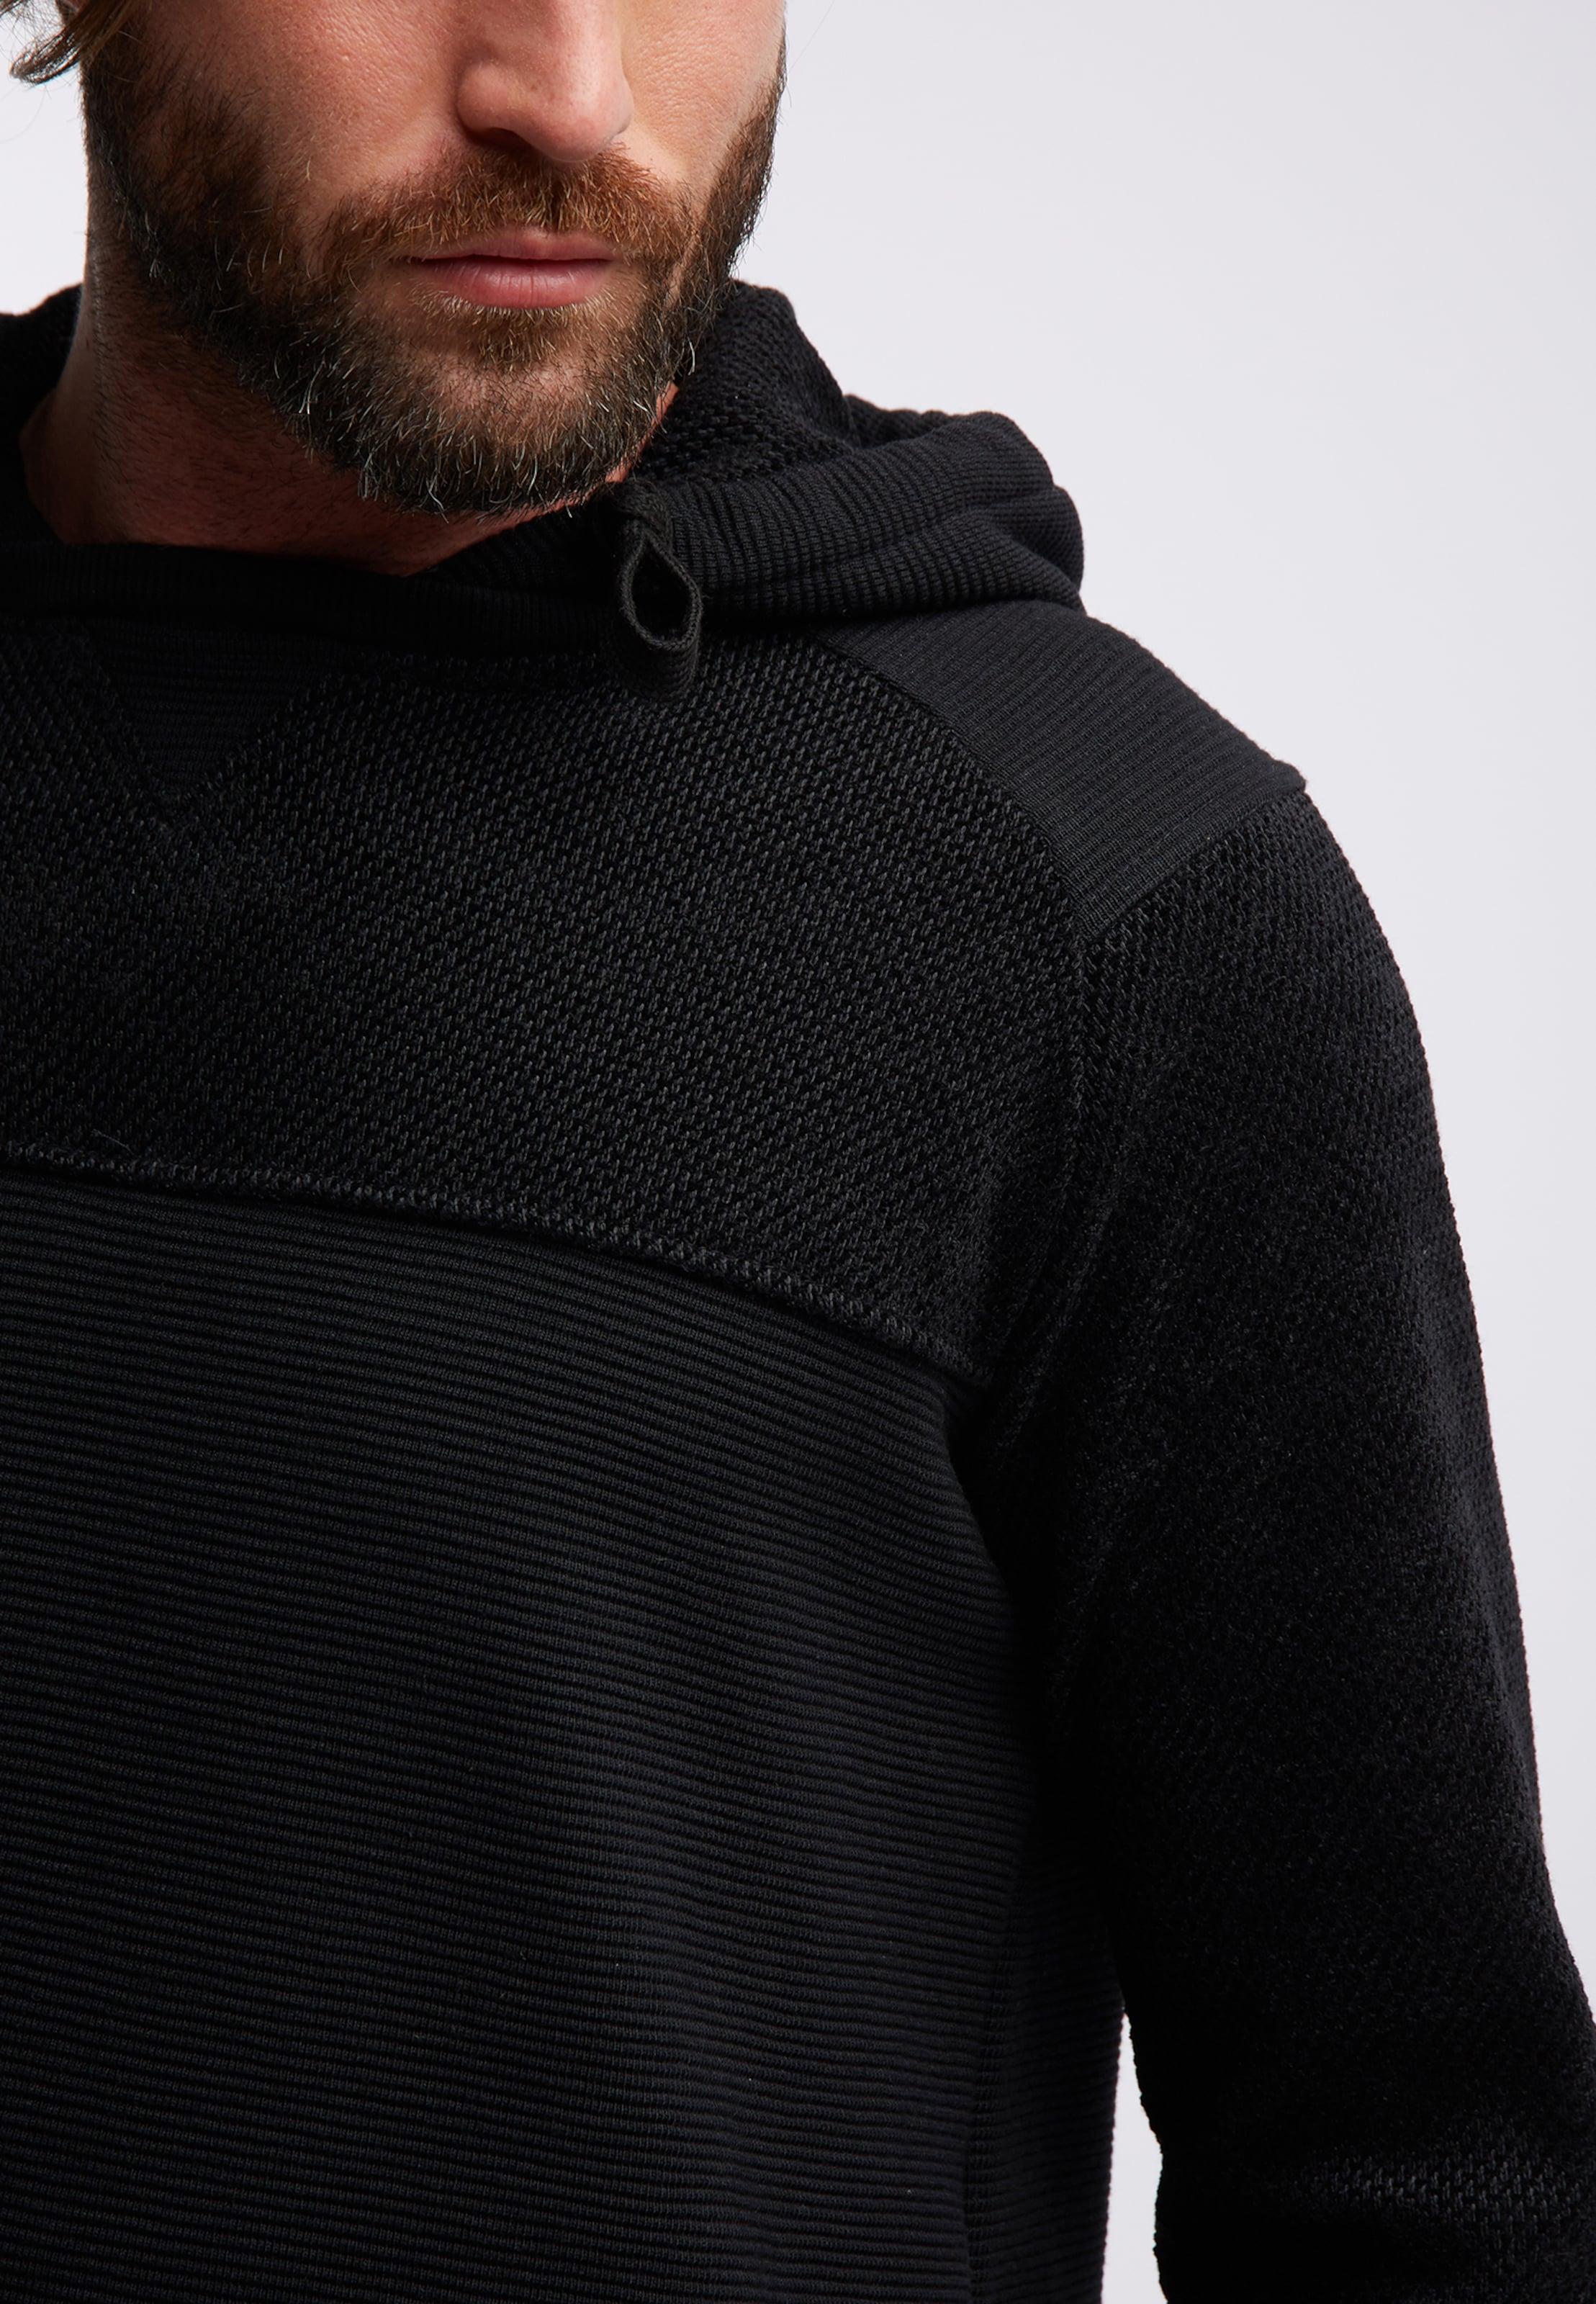 Tuffskull En shirt Sweat Sweat Noir Tuffskull 92HWEDIY